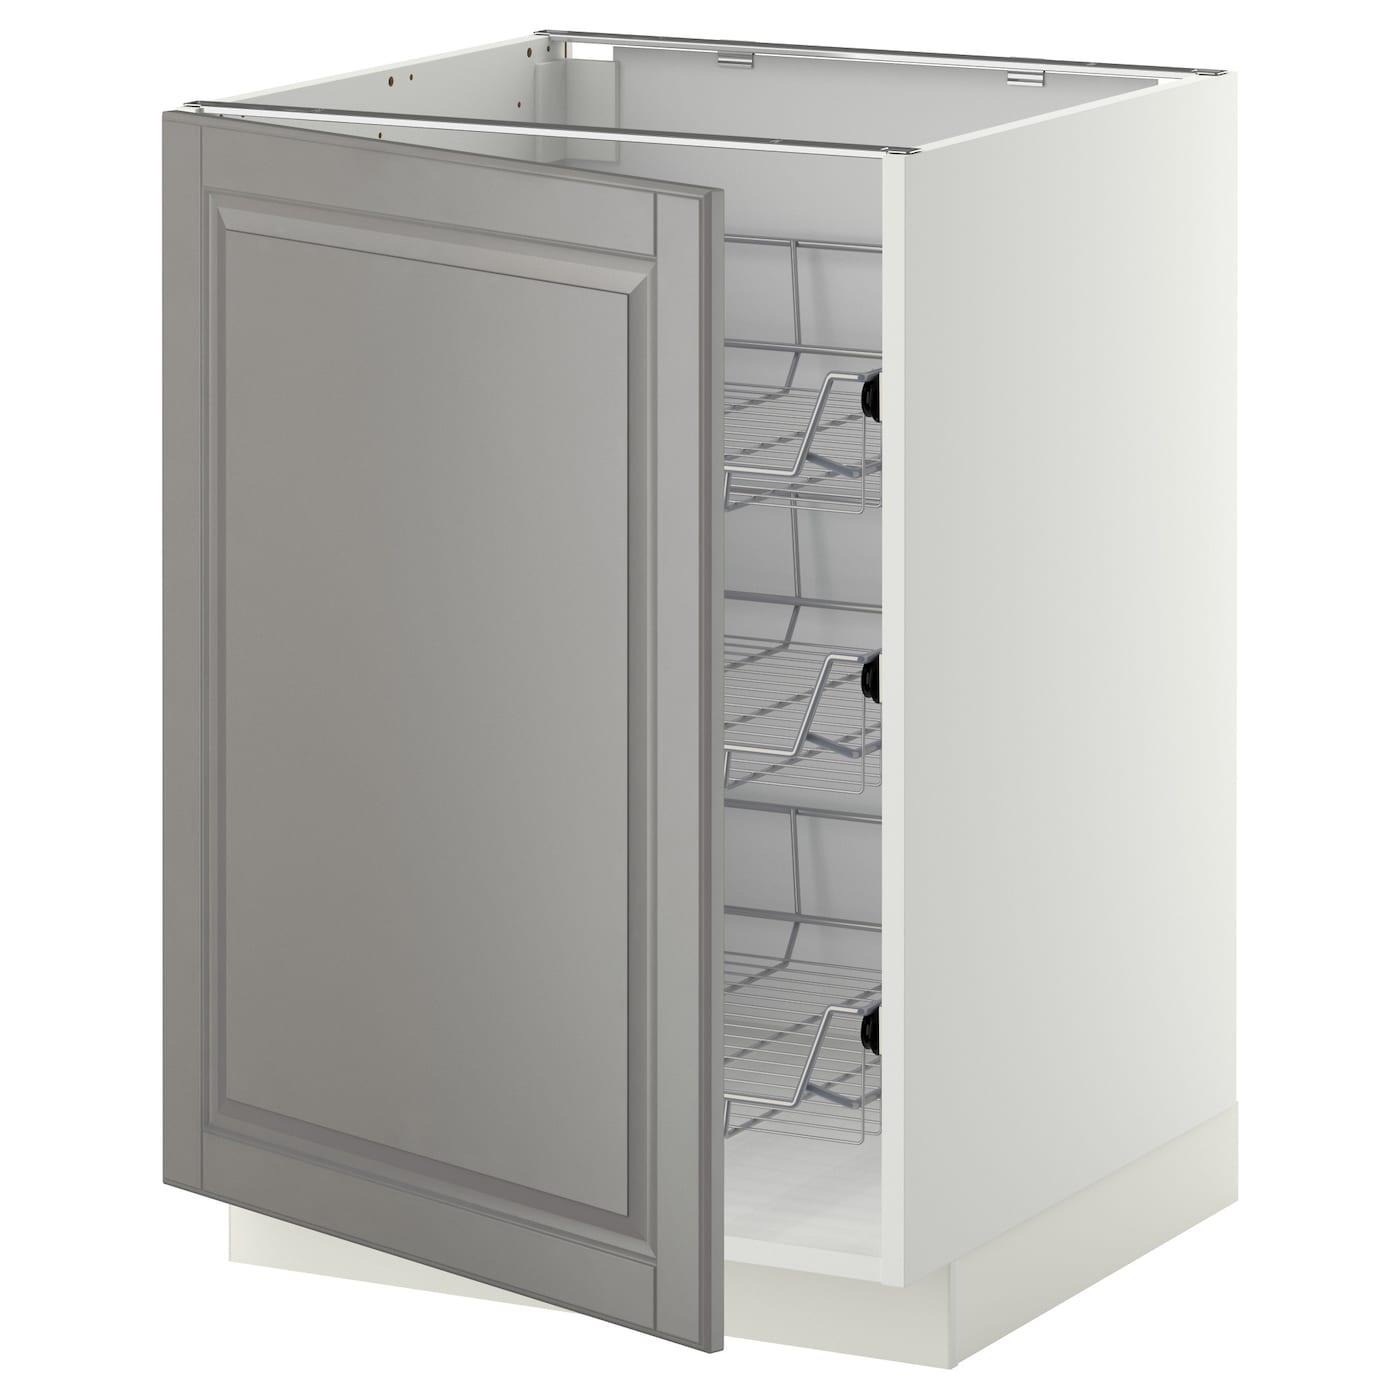 Ikea Bodbyn Kitchen Ikea Bodbyn Kitchen Grey And White: METOD Base Cabinet With Wire Baskets White/bodbyn Grey 60